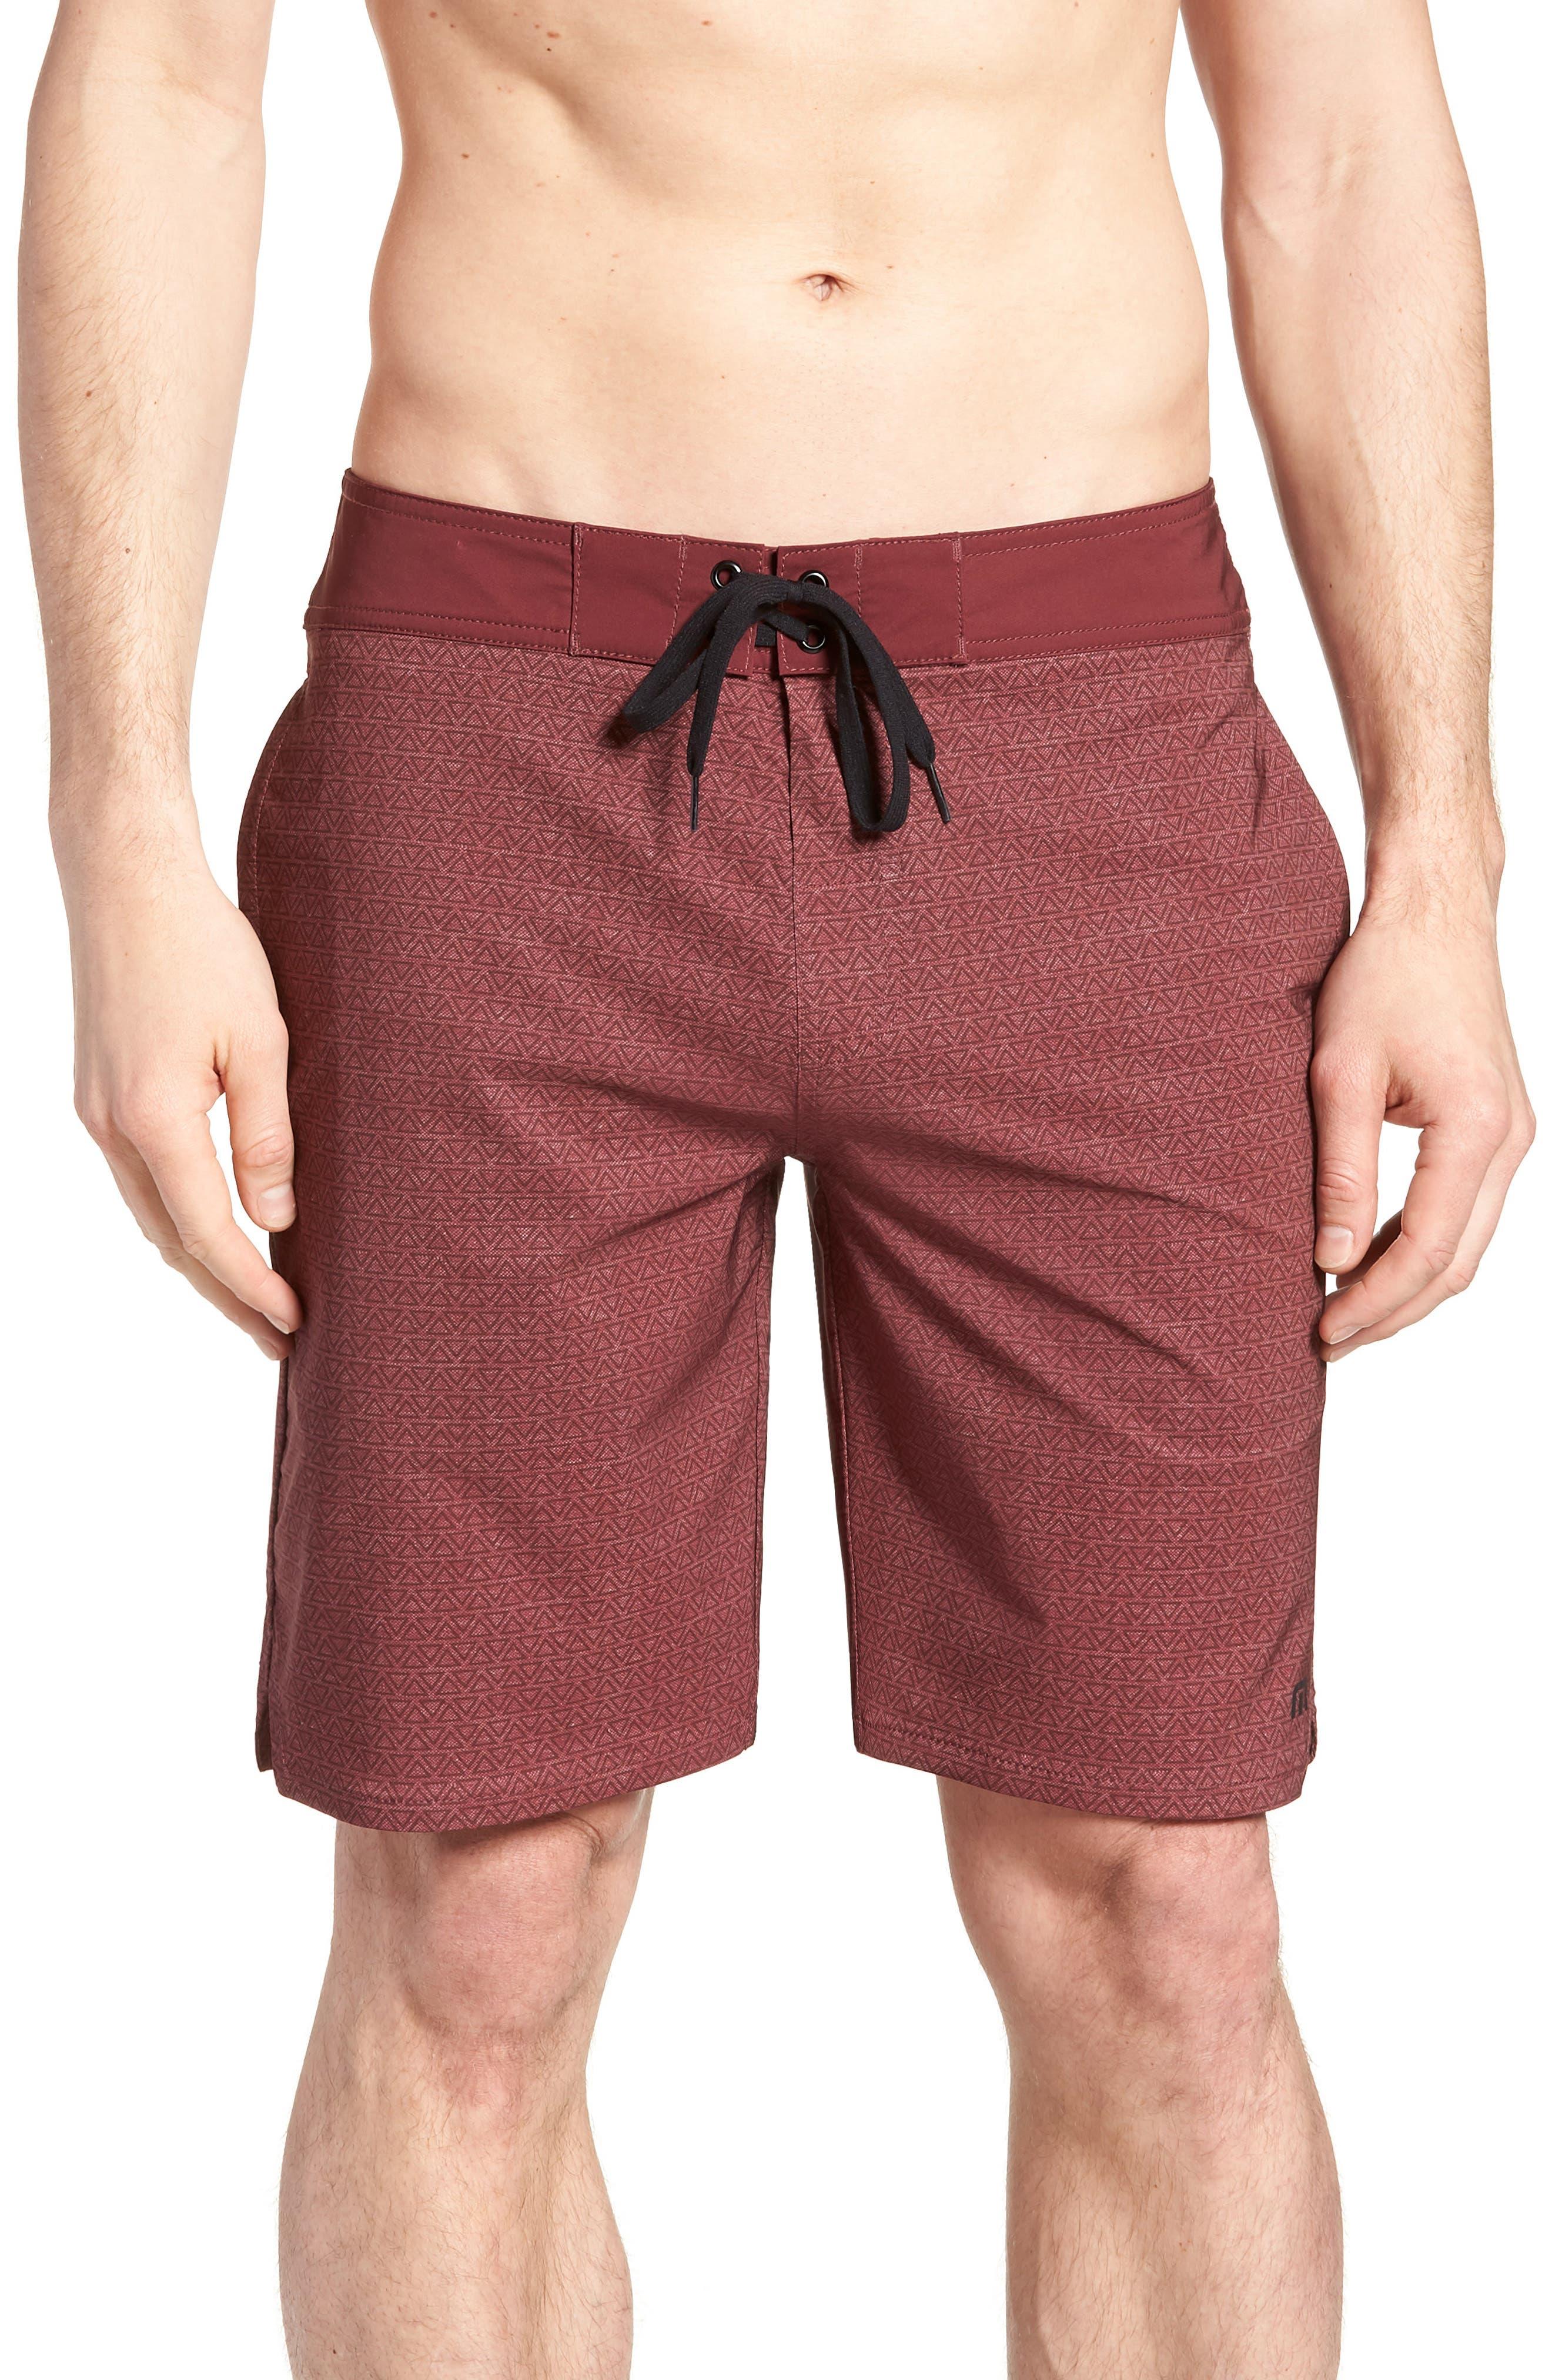 Blanders Regular Fit Board Shorts,                             Main thumbnail 1, color,                             Oxblood